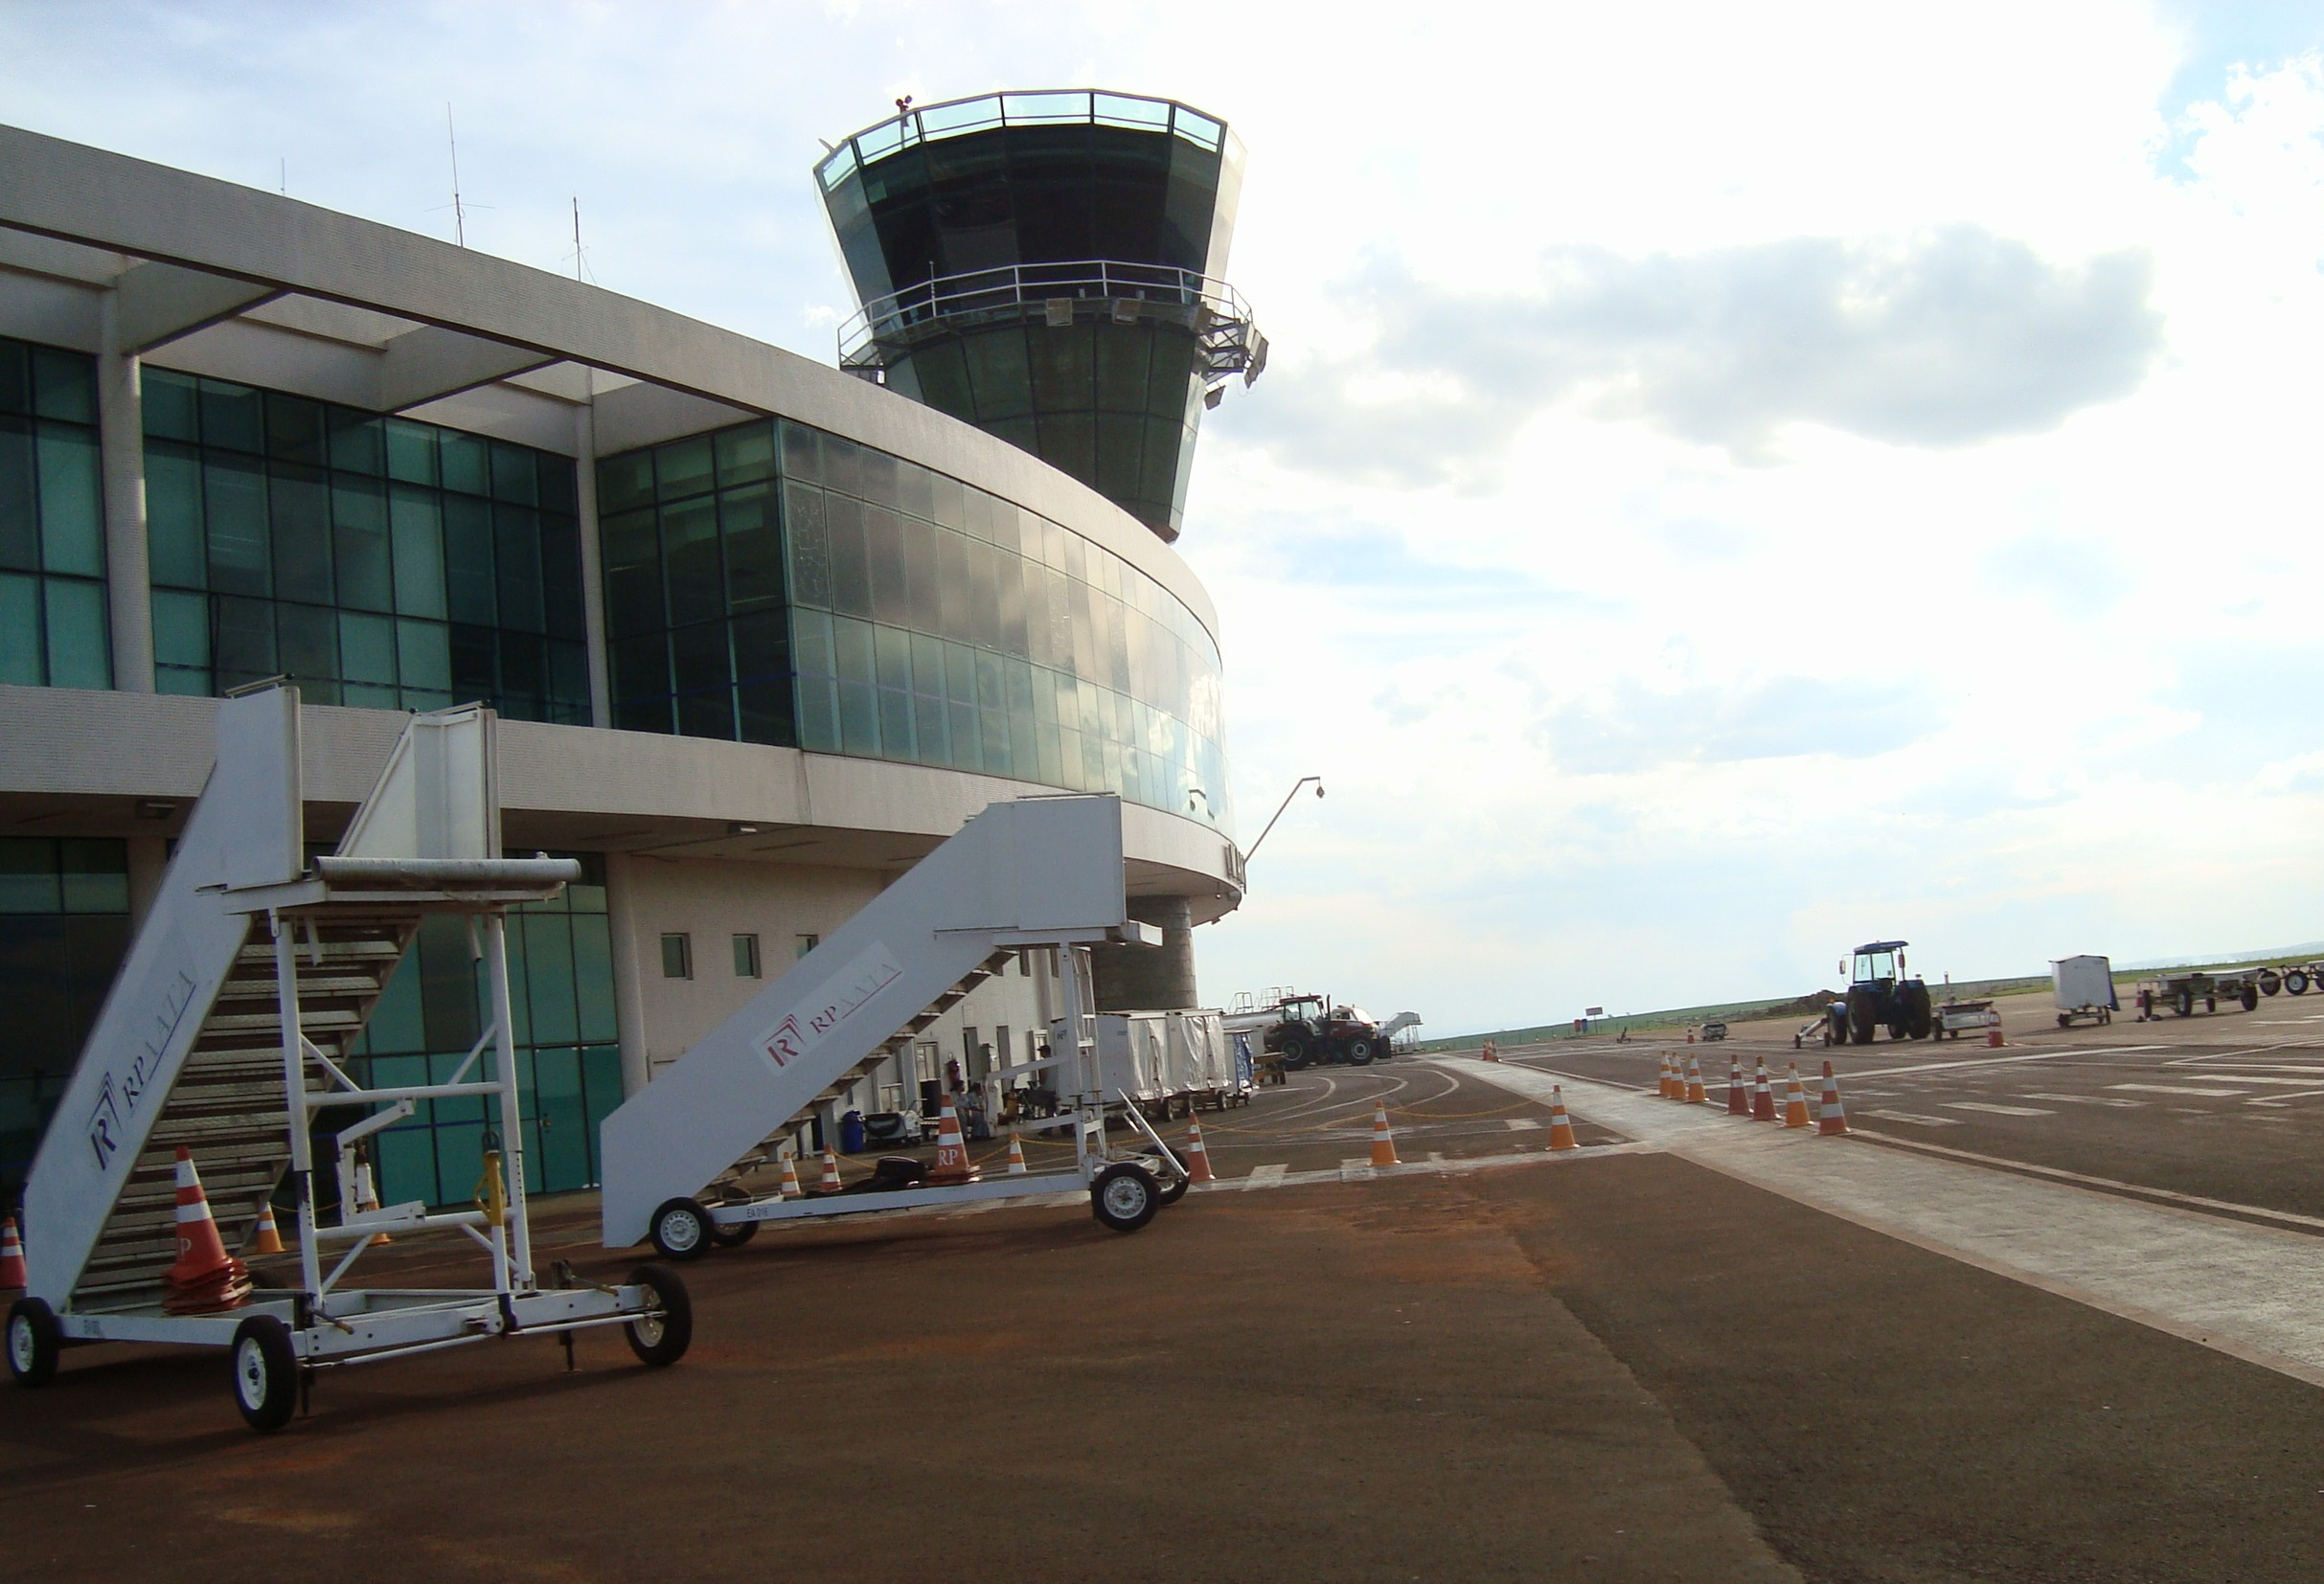 SAC autoriza abertura de licitação para ampliar aeroporto de Maringá